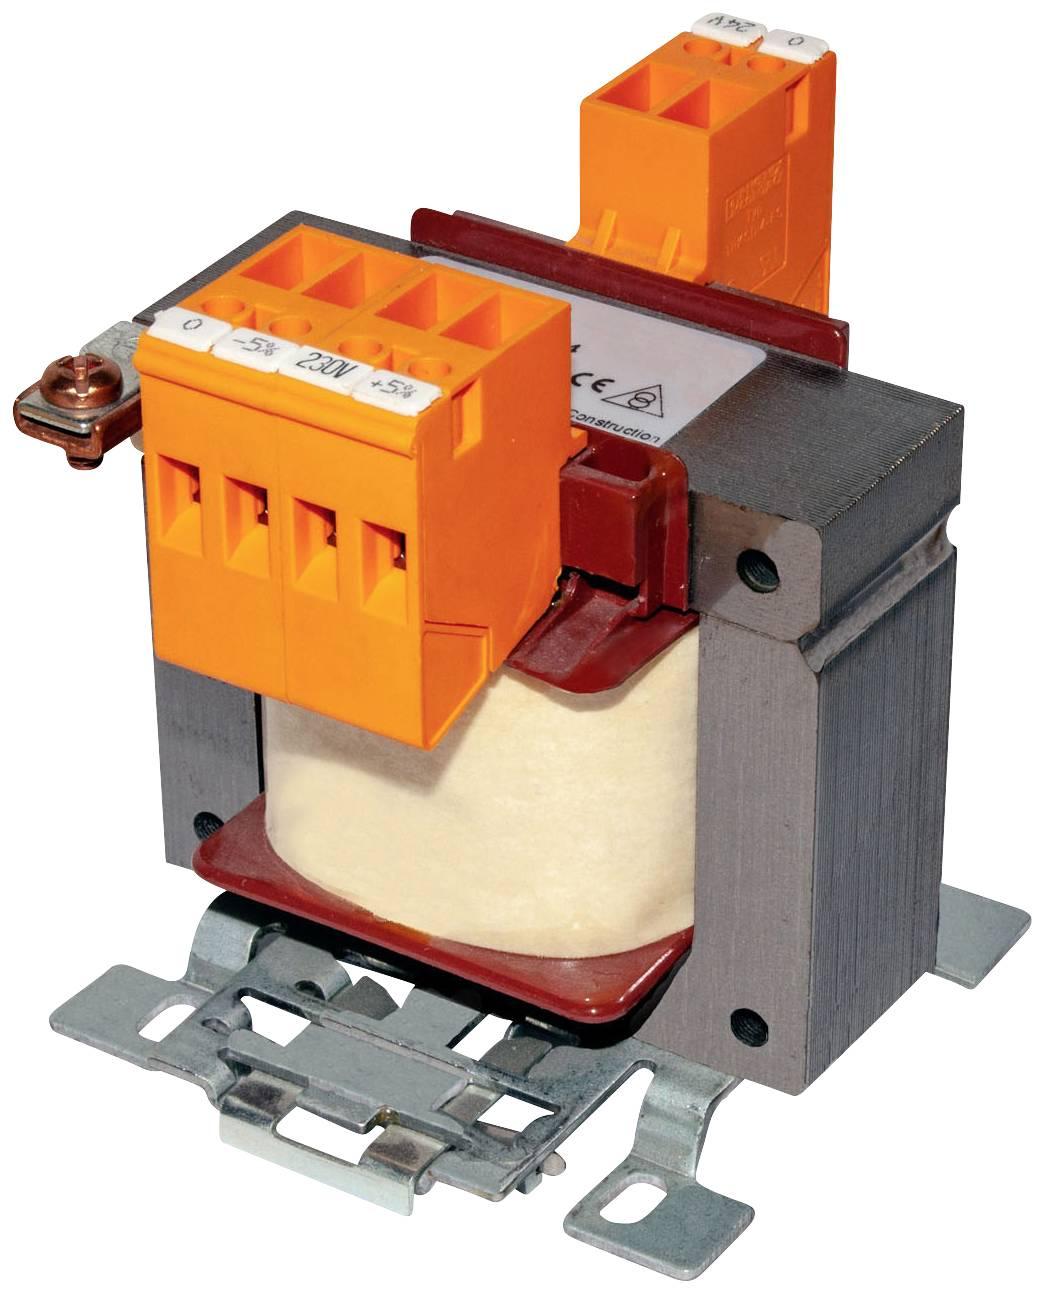 Riadiaci transformátor Weiss Elektrotechnik WUSTTR 250/1124, 250 VA